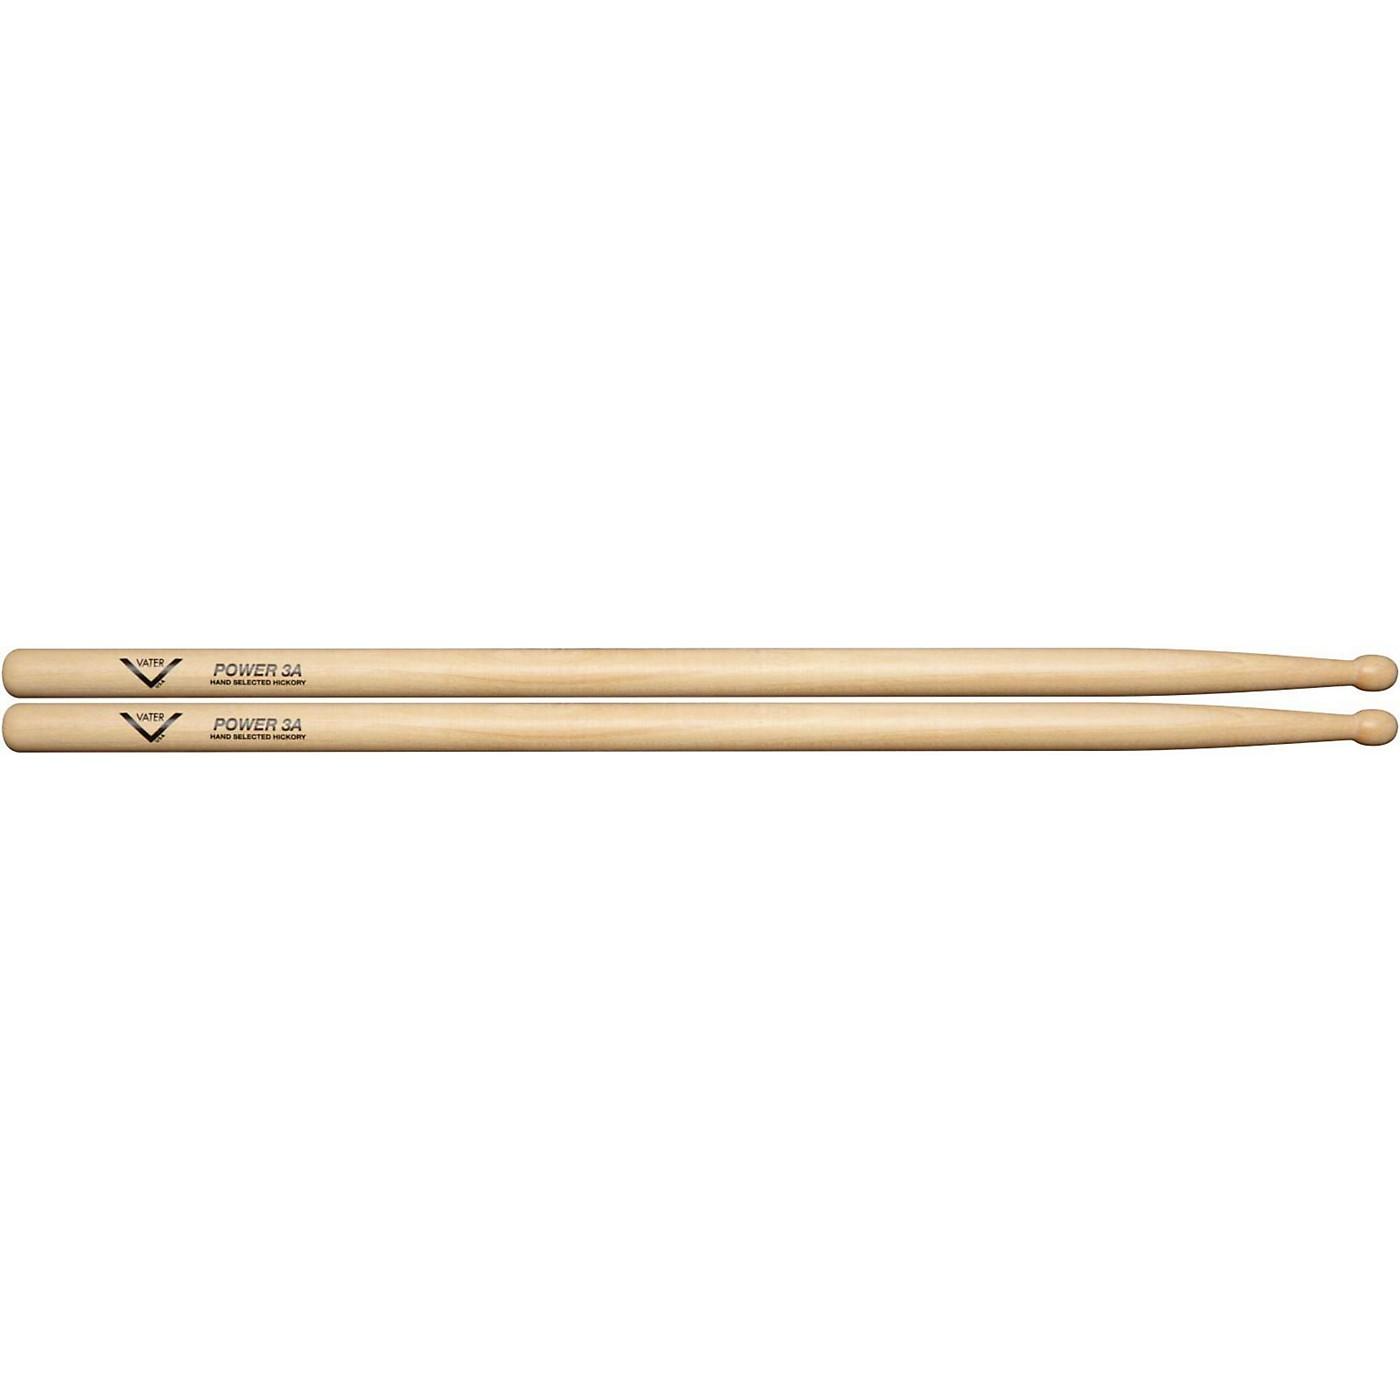 Vater Power Wood Tip Drumsticks - Pair thumbnail